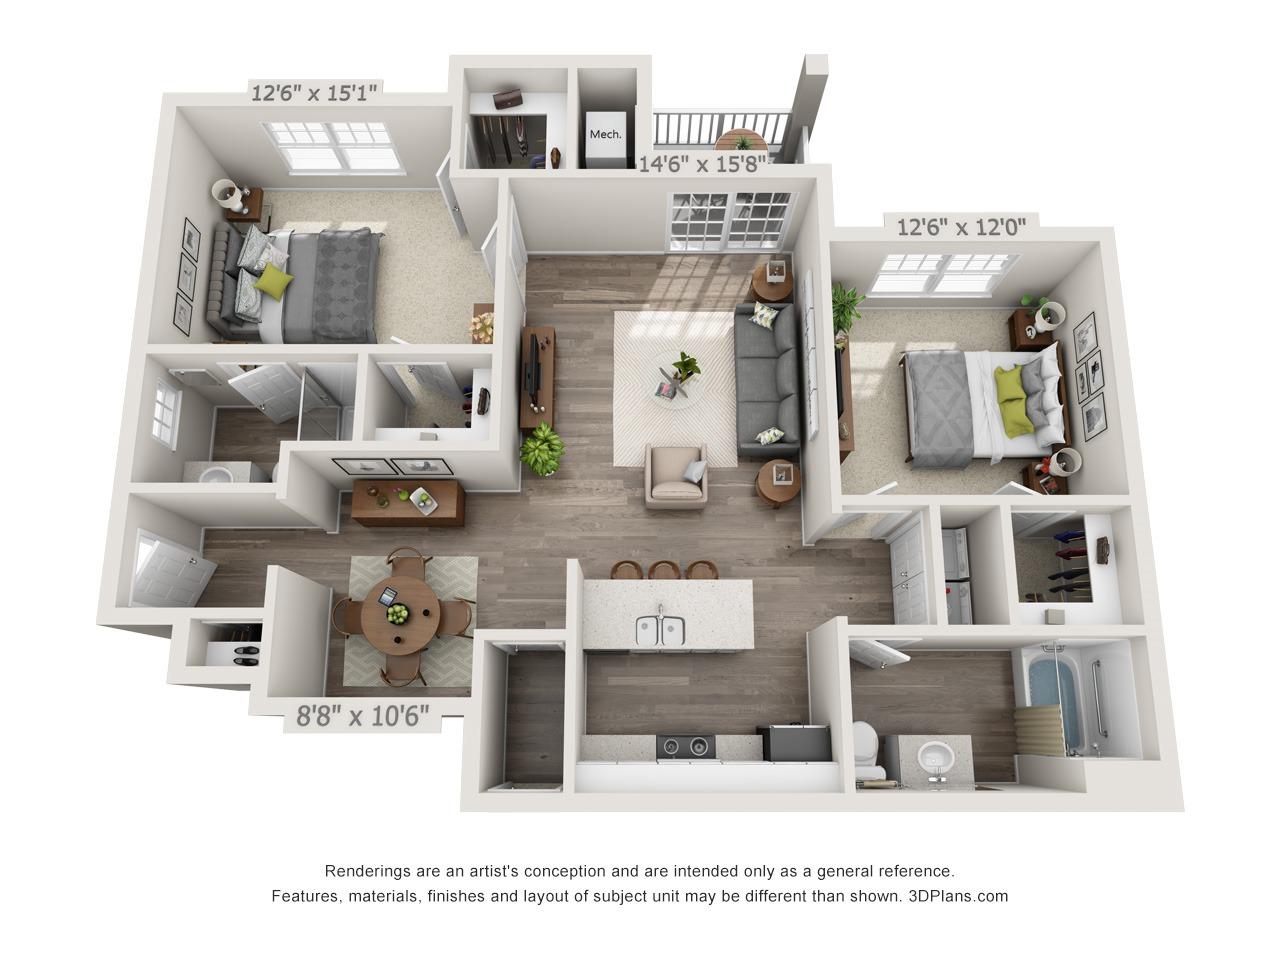 Hunter - 2 Bed / 2 Bath - 1st Floor - 1,143 SF